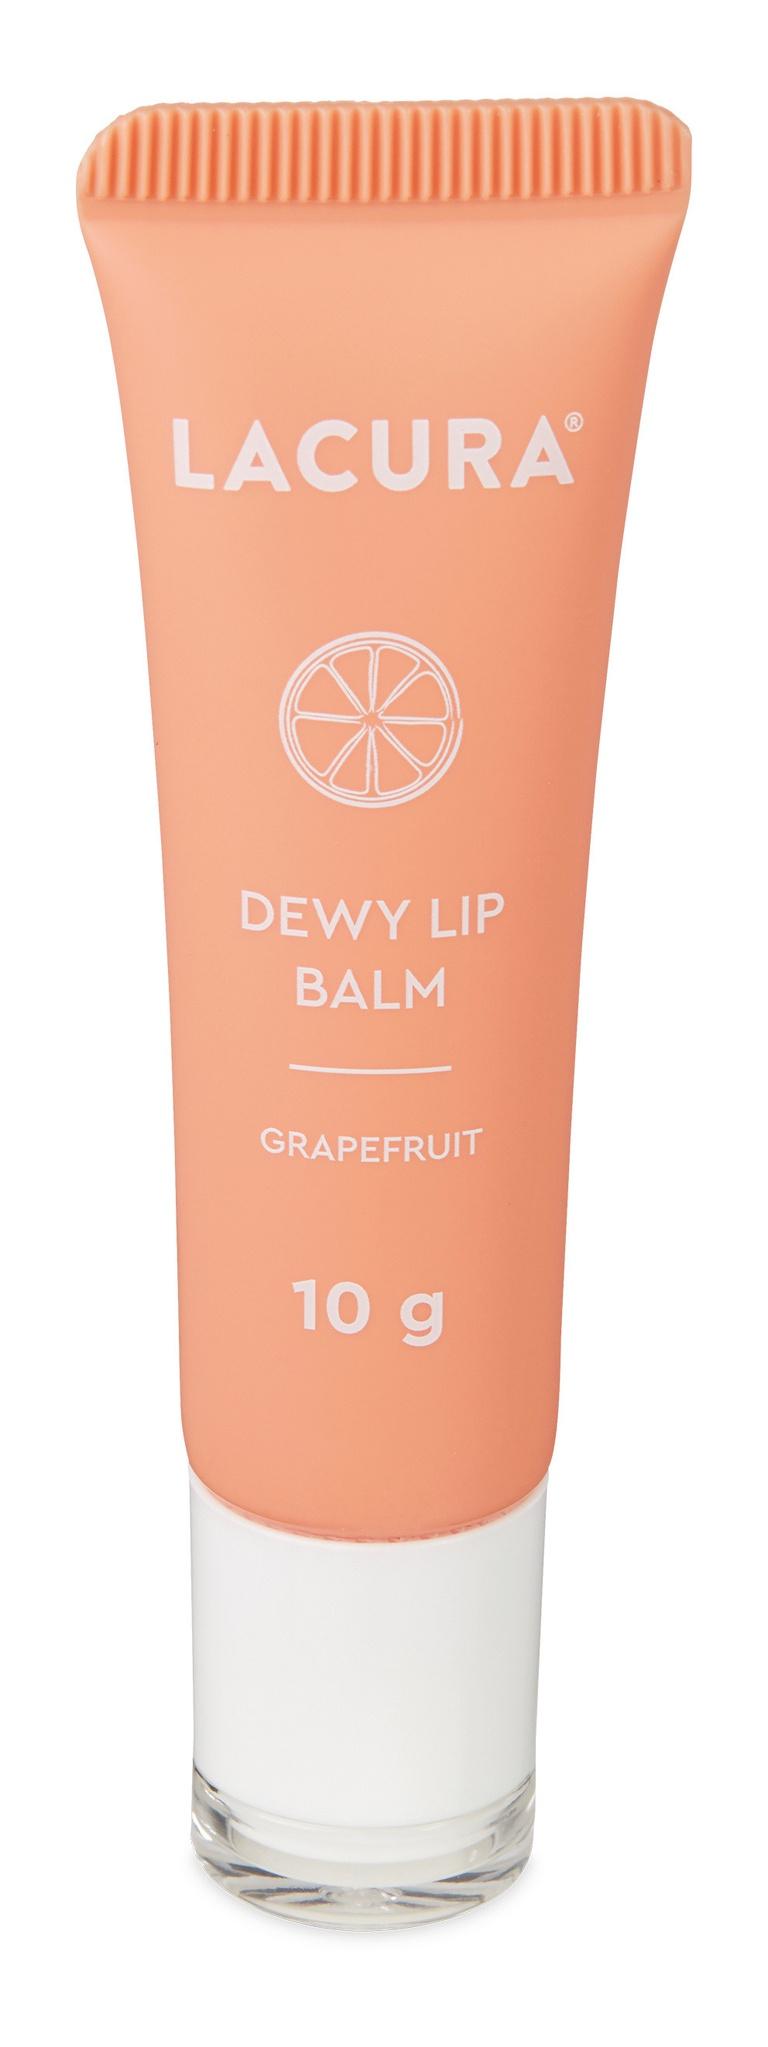 LACURA Dewy Lip Balm - Grapefruit